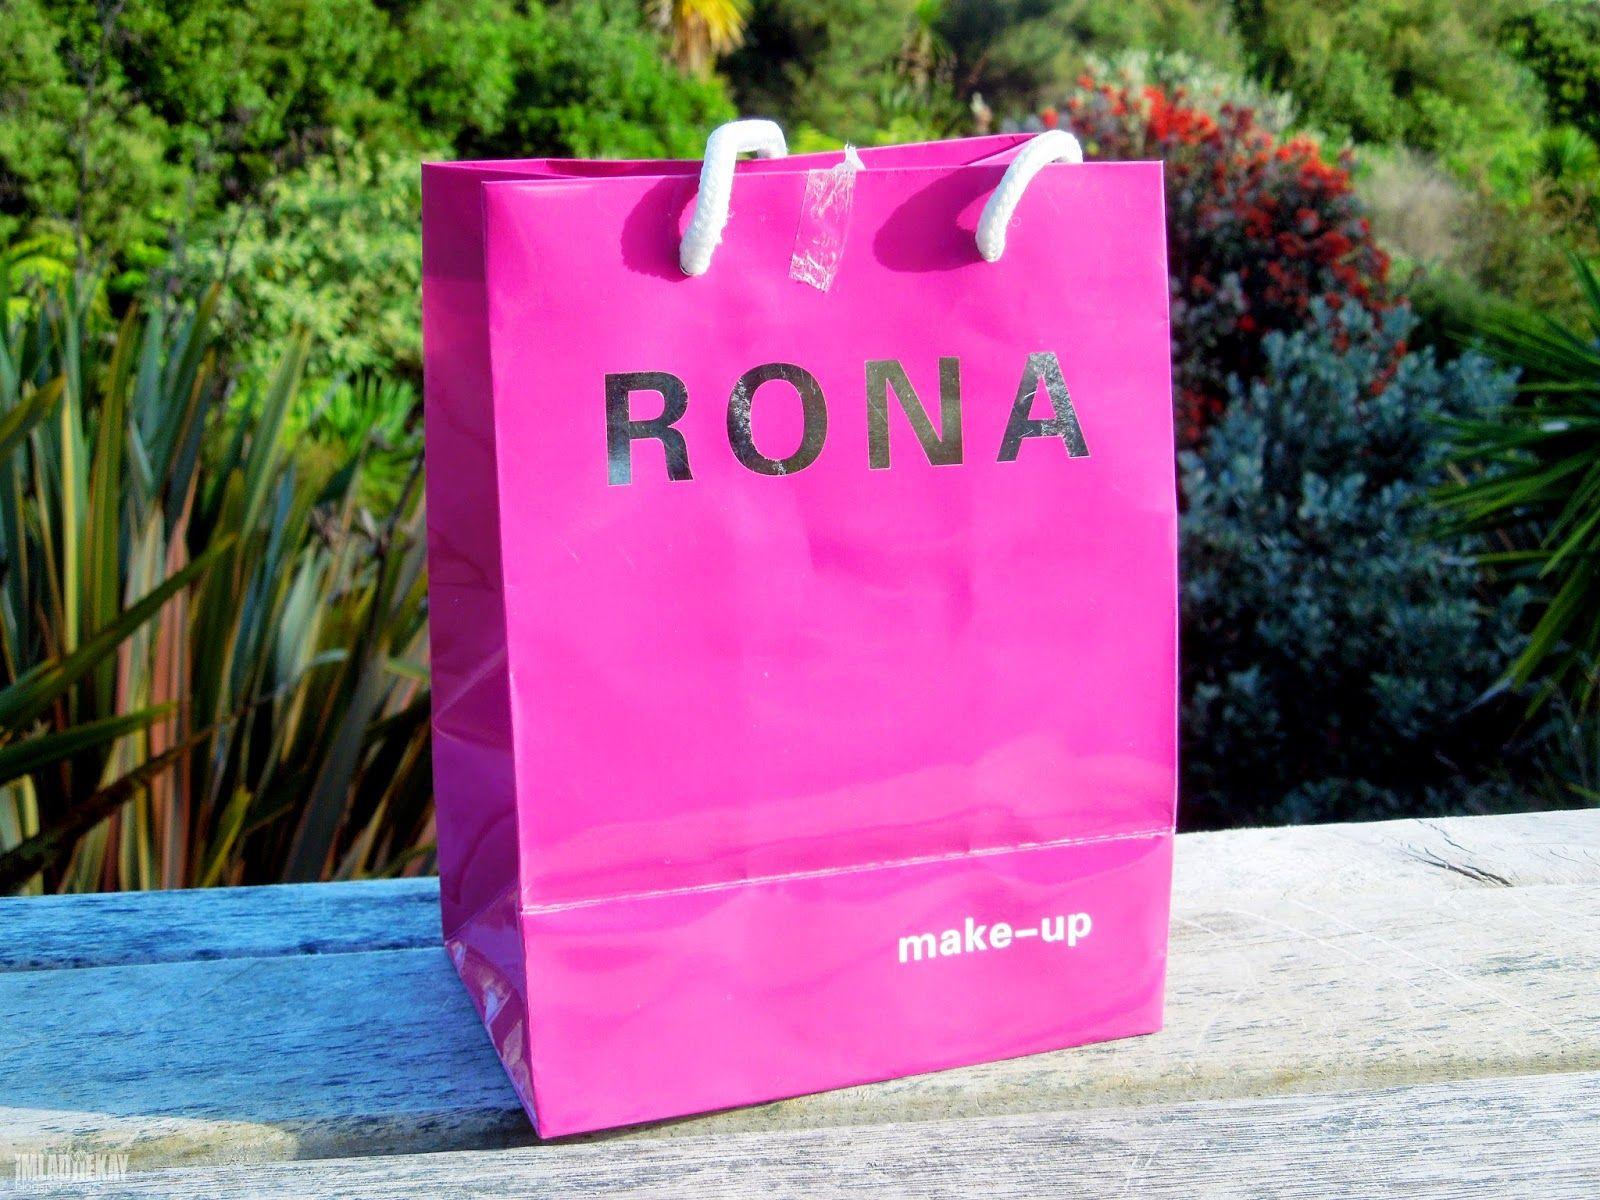 imladiiekay ♡ Beauty & Lifestyle Blog: RONA Makeup Haul ♡ ft. Holika Holika Pig-Nose Clear Blackhead 3-Step Kit Demo